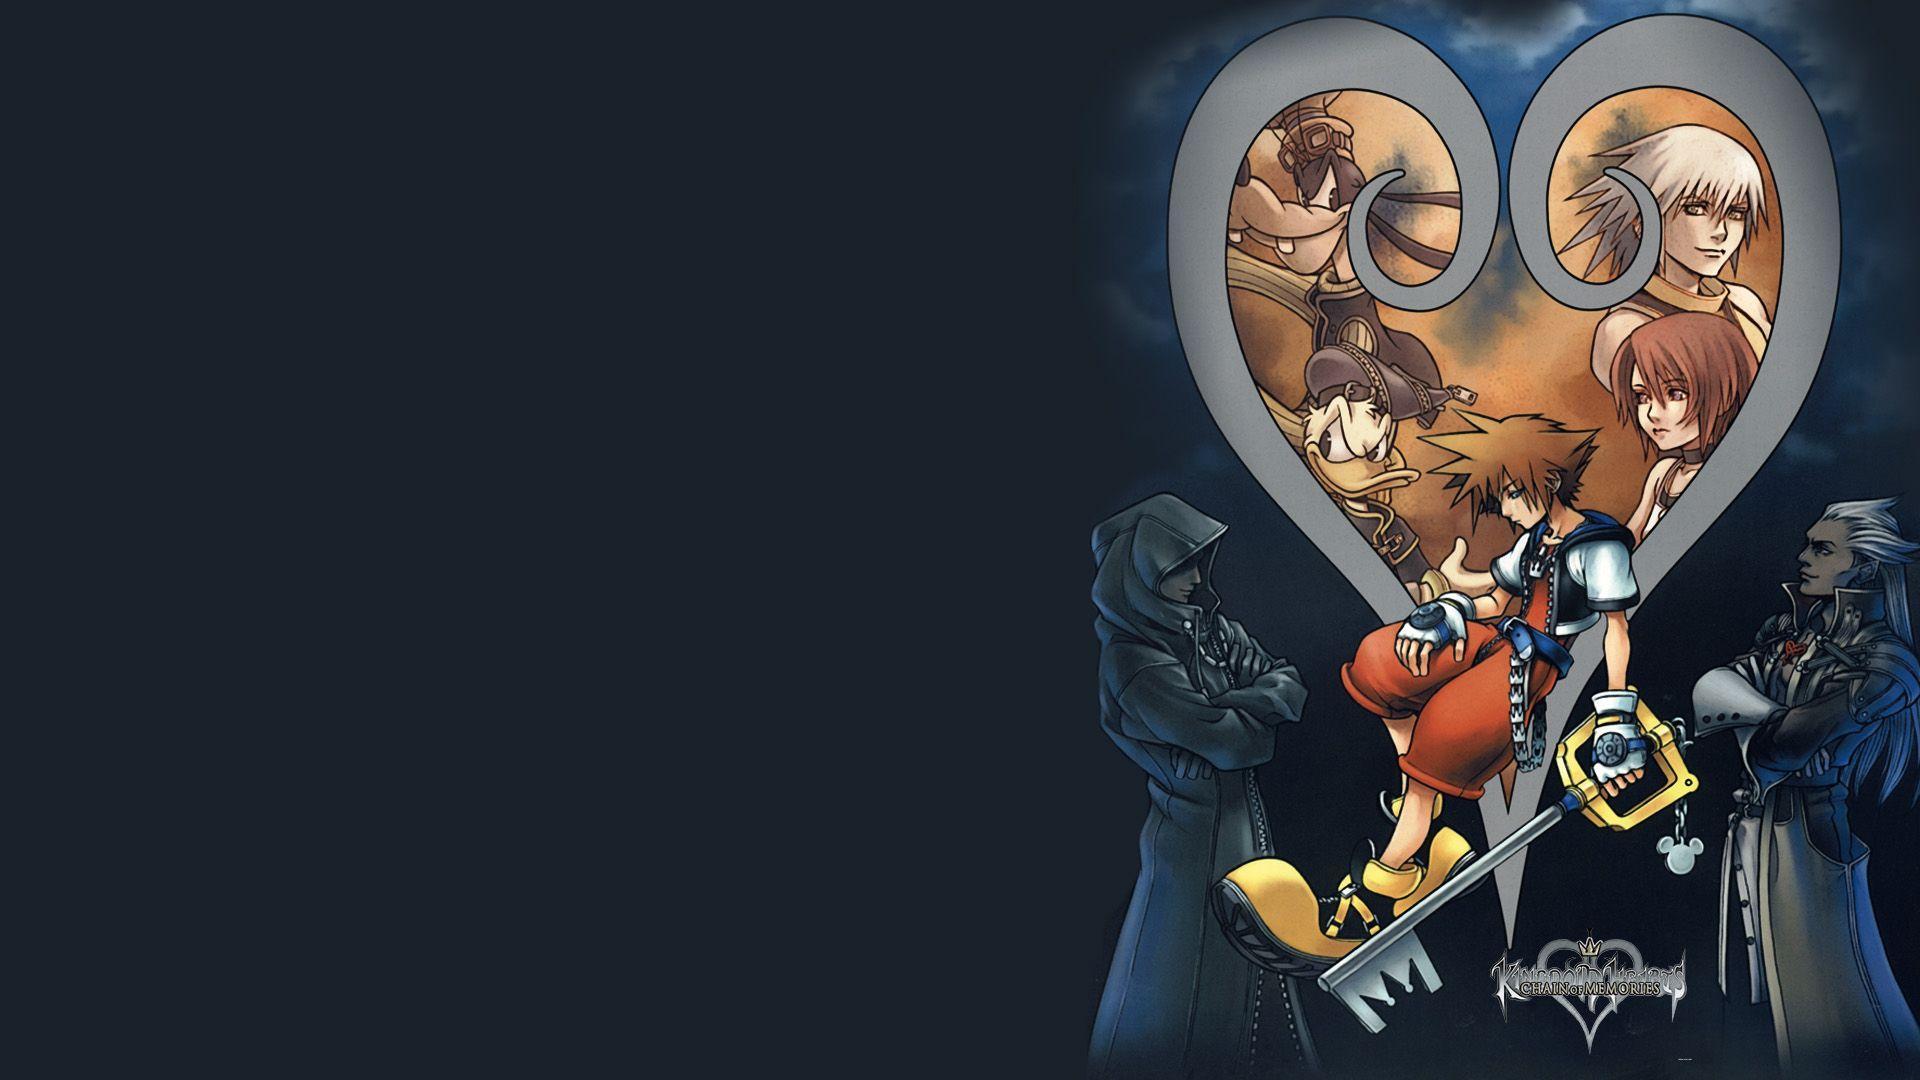 Kingdom Hearts Wallpapers Top Free Kingdom Hearts Backgrounds